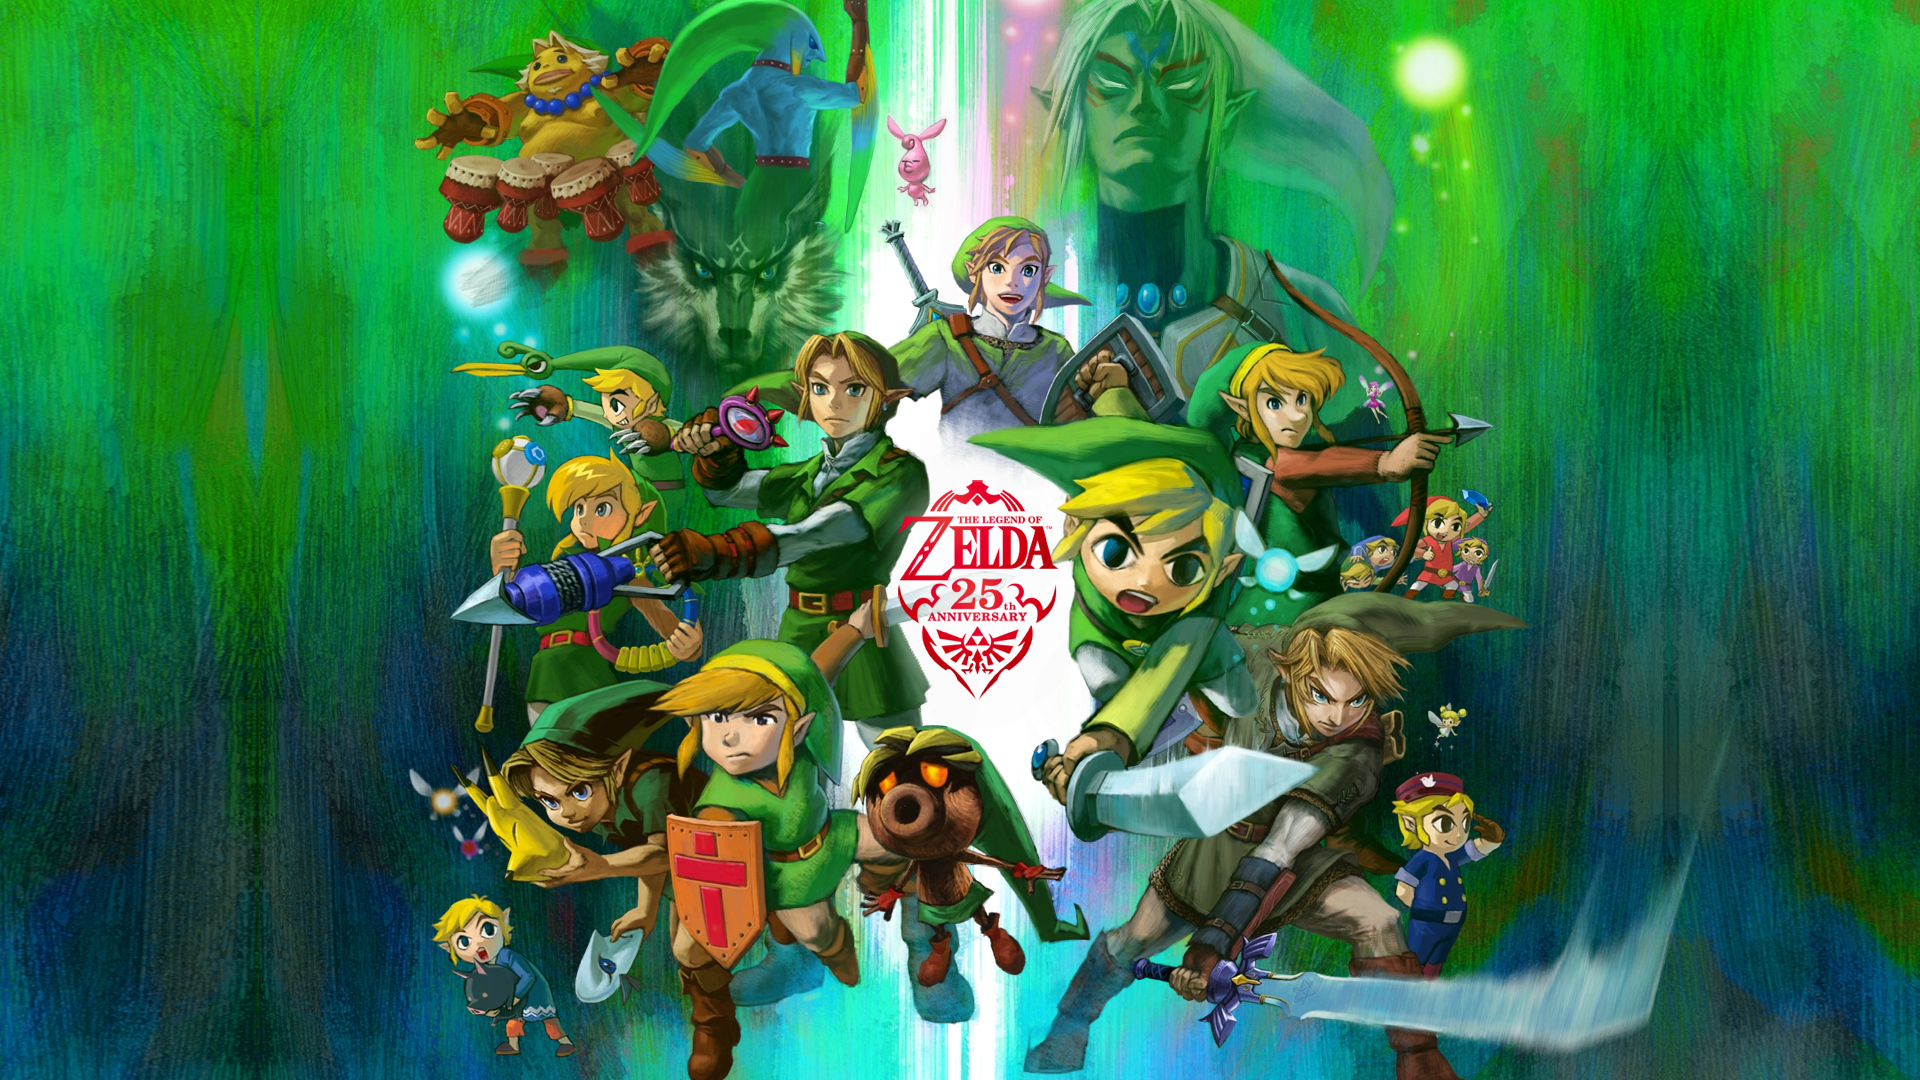 The Legend of Zelda Wallpaper HD Wallpapers Backgrounds Images 1920x1080